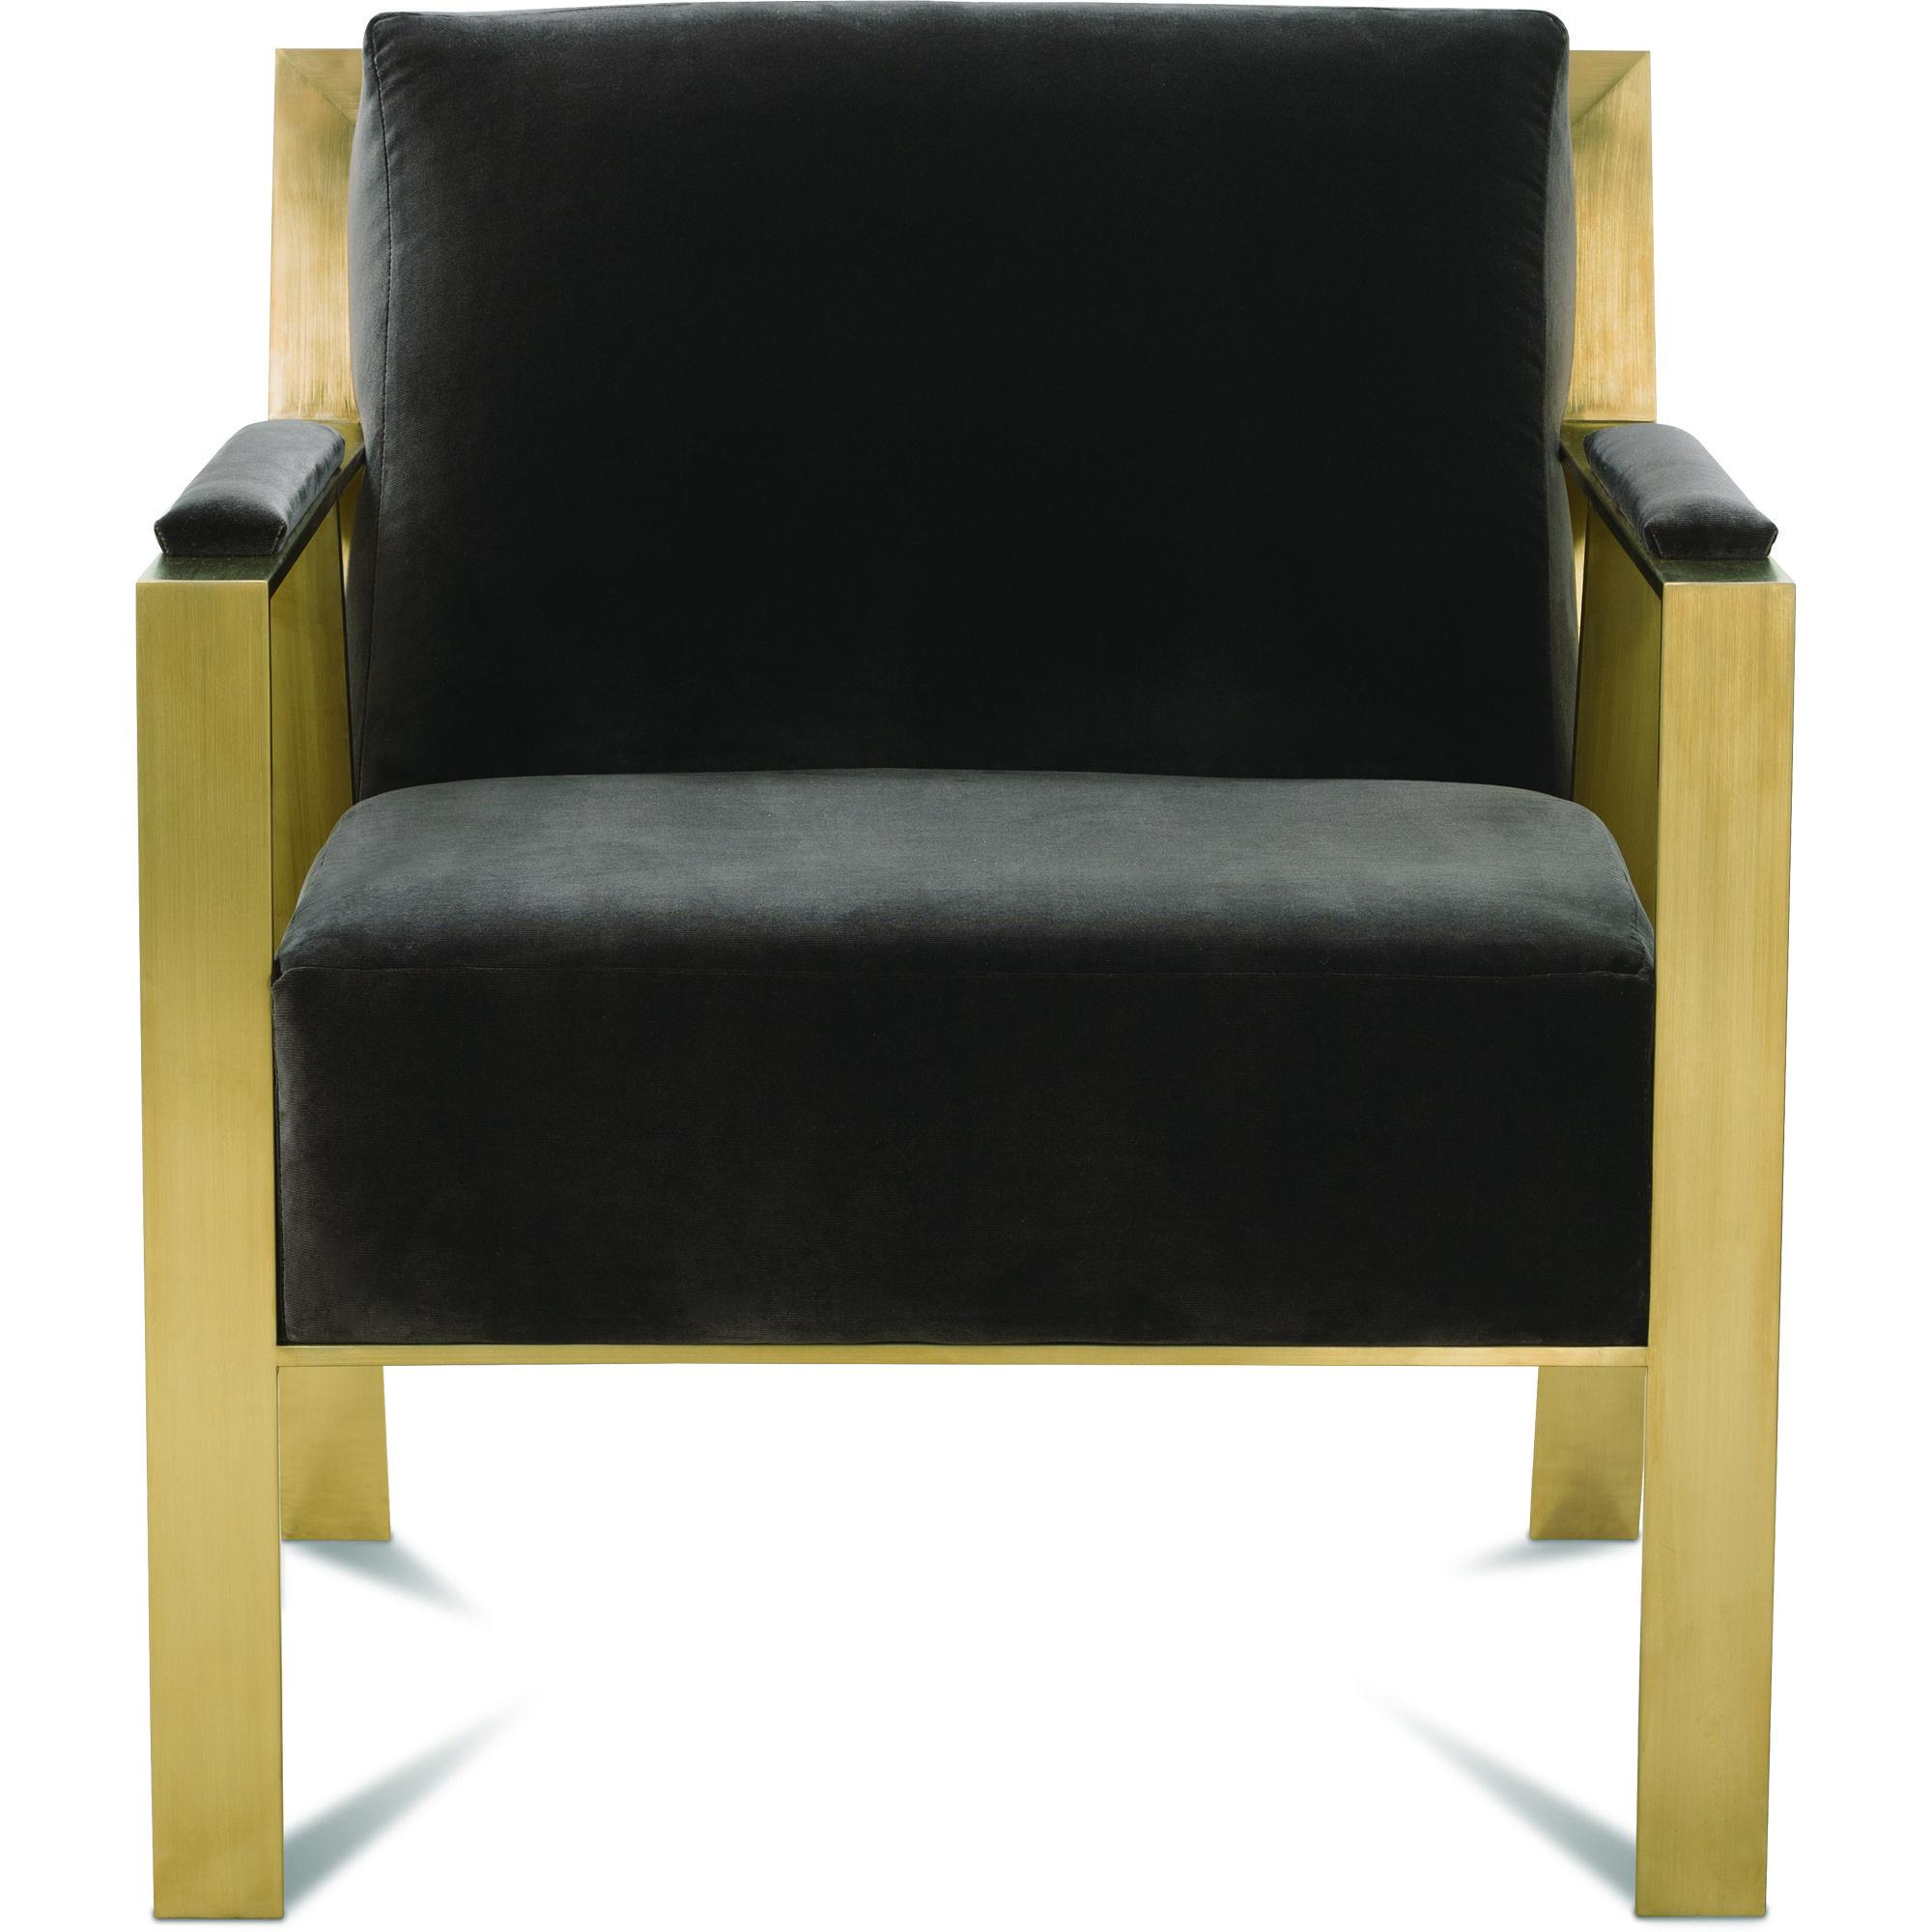 k lots llemo post dorado sweden bukowskis mats leather kallemo and auctions el chair en armchair brass fullsize theselius a